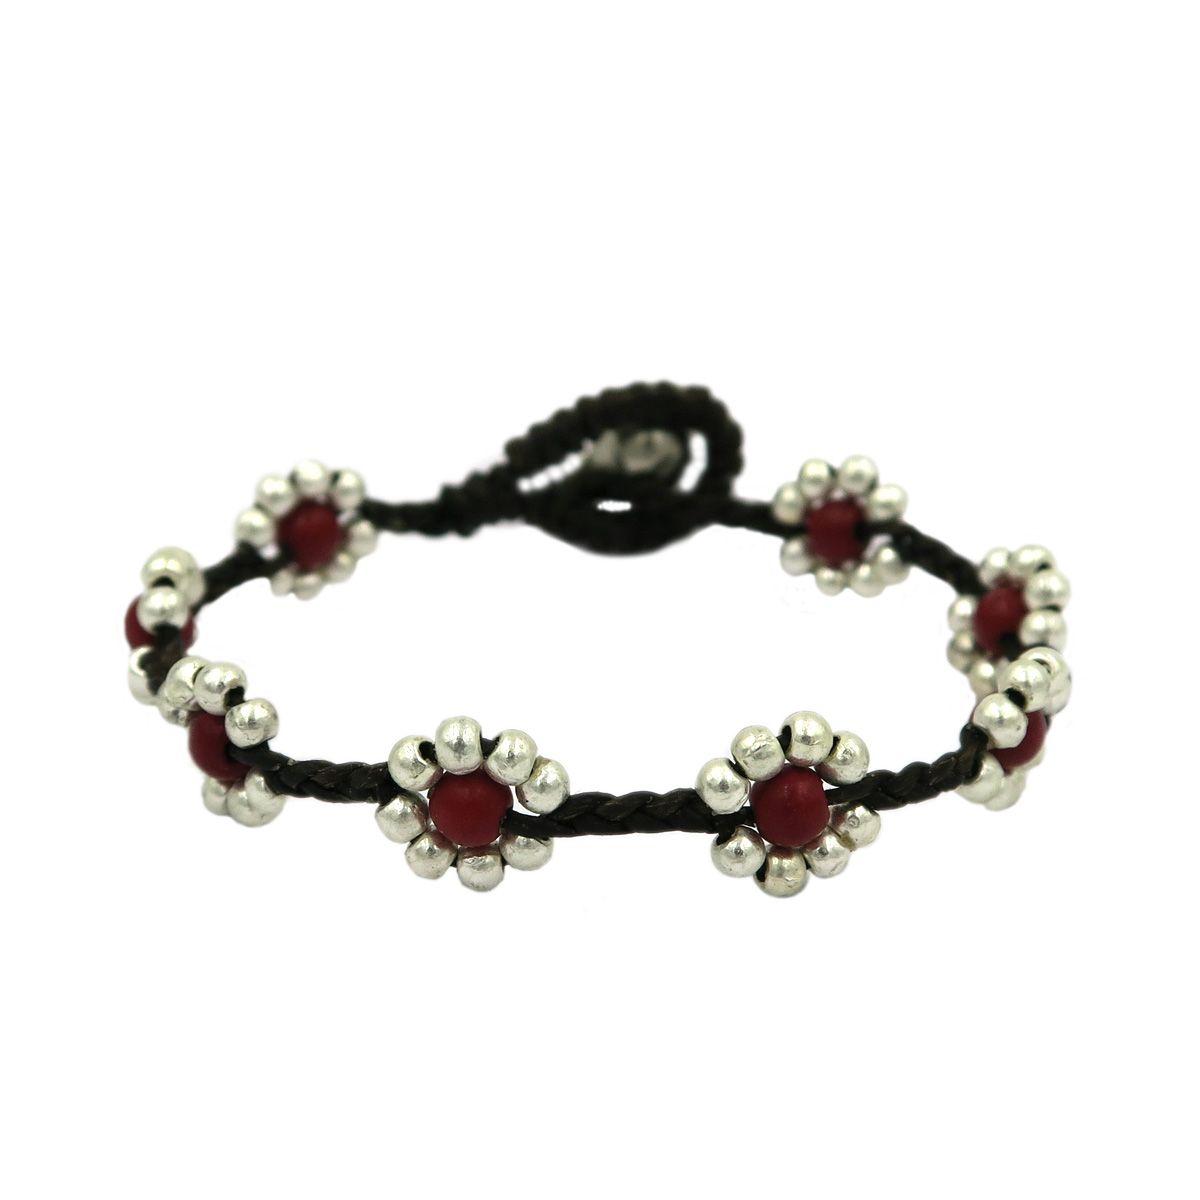 Magica Made in Bali Exotic Jewelry